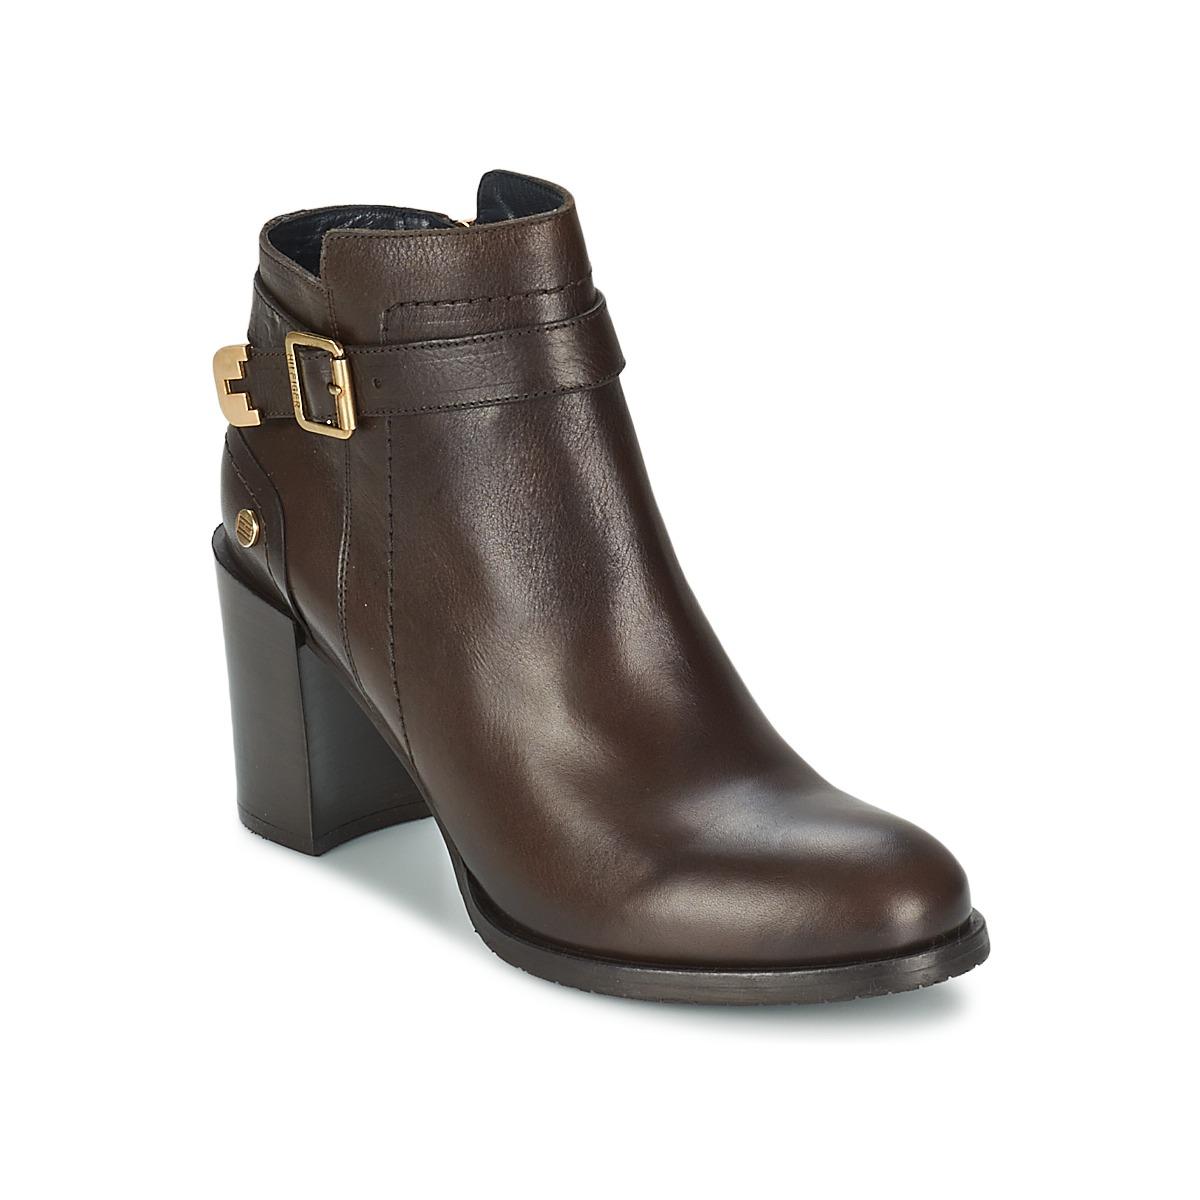 Tommy Hilfiger PENELOPE 3A Braun - Kostenloser Versand bei Spartoode ! - Schuhe Low Boots Damen 140,80 €